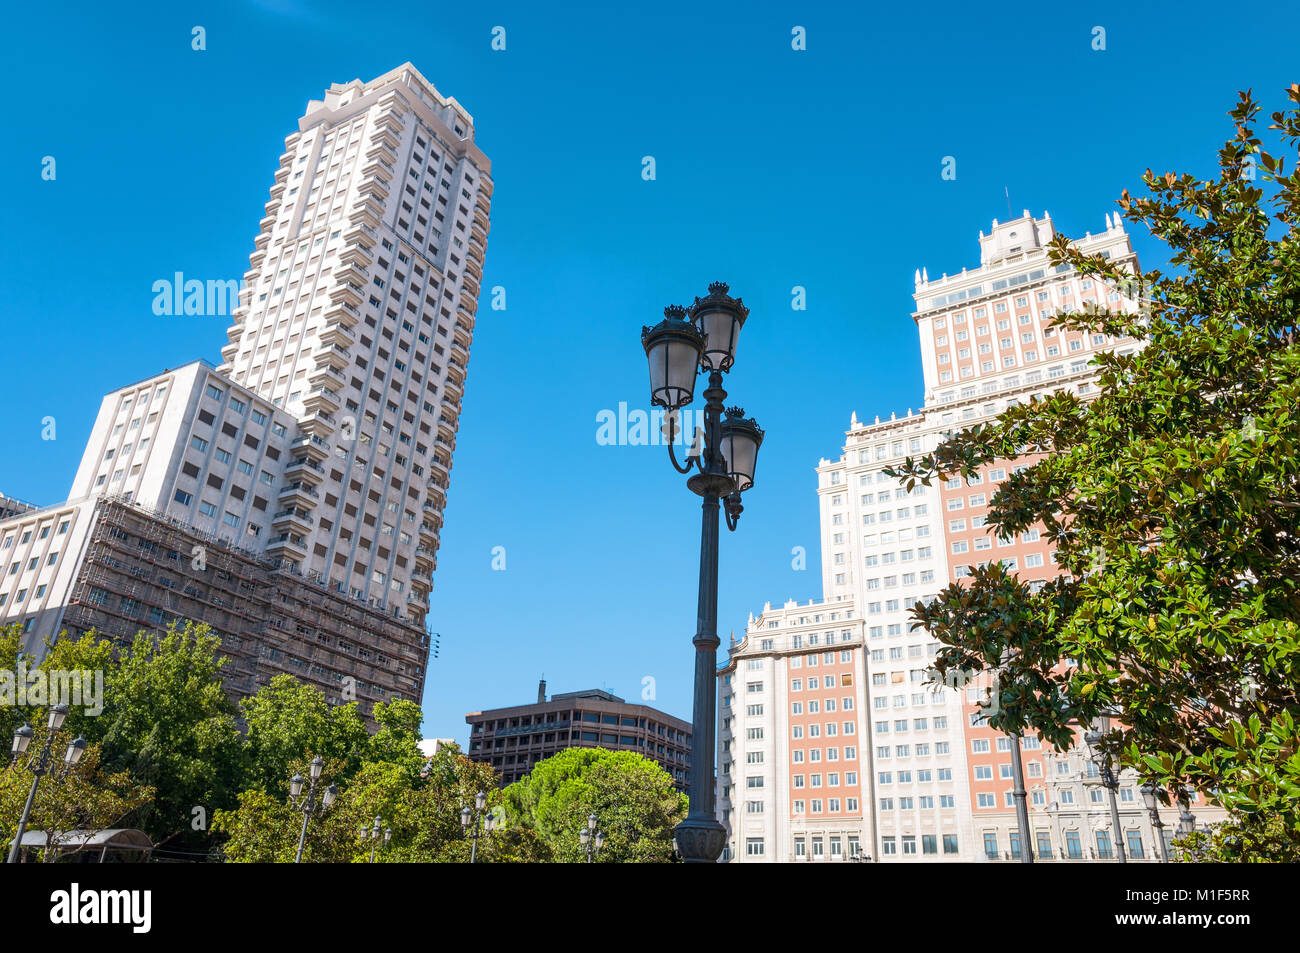 Spain, Madrid, the imposing architectures of Plaza De Espana - Stock Image